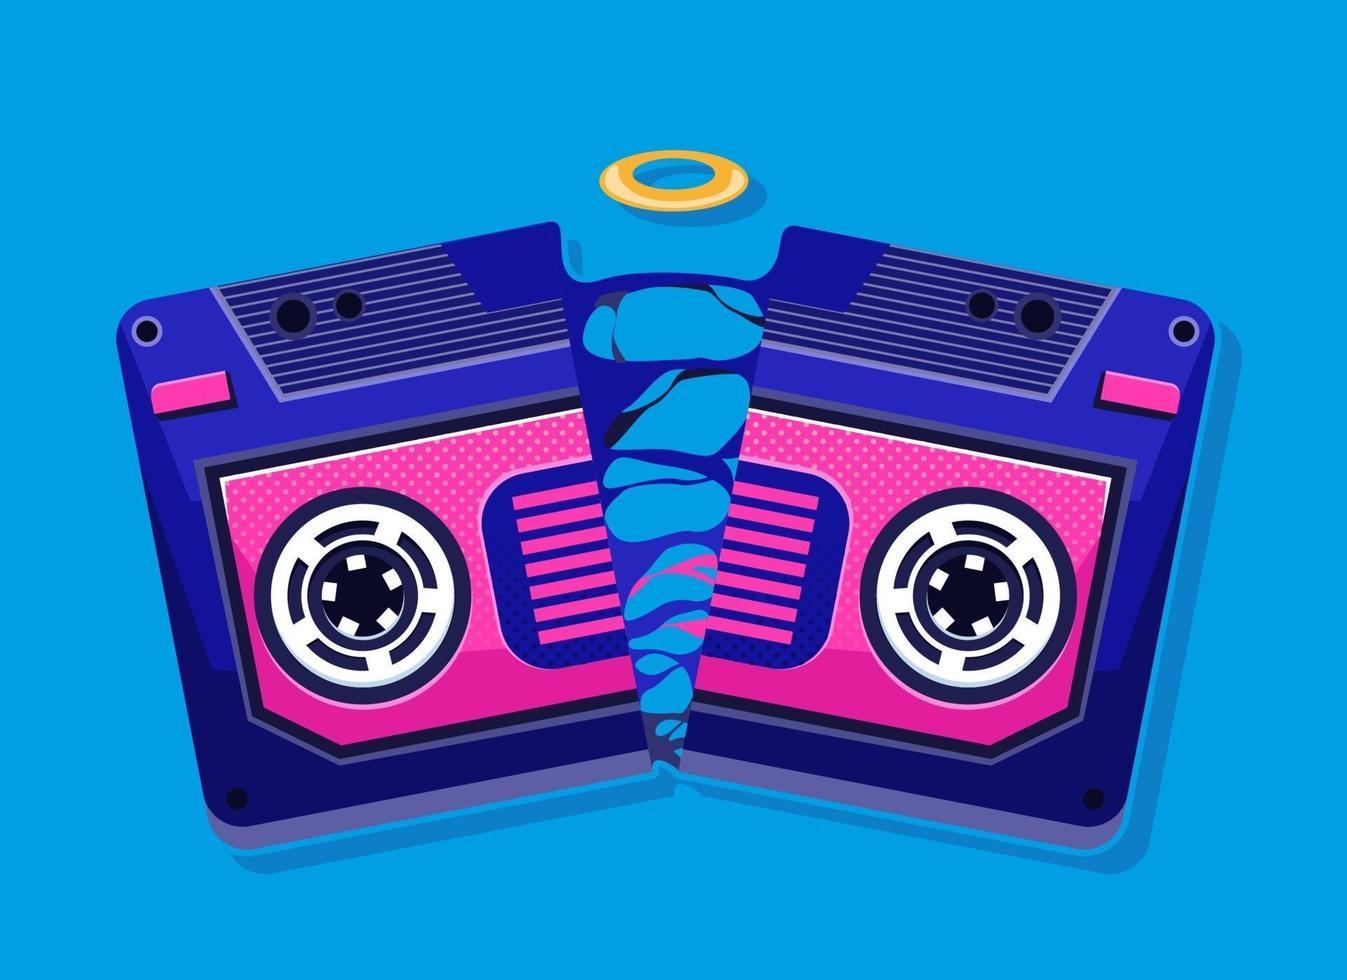 Cassette broken illustration. Vector fun art